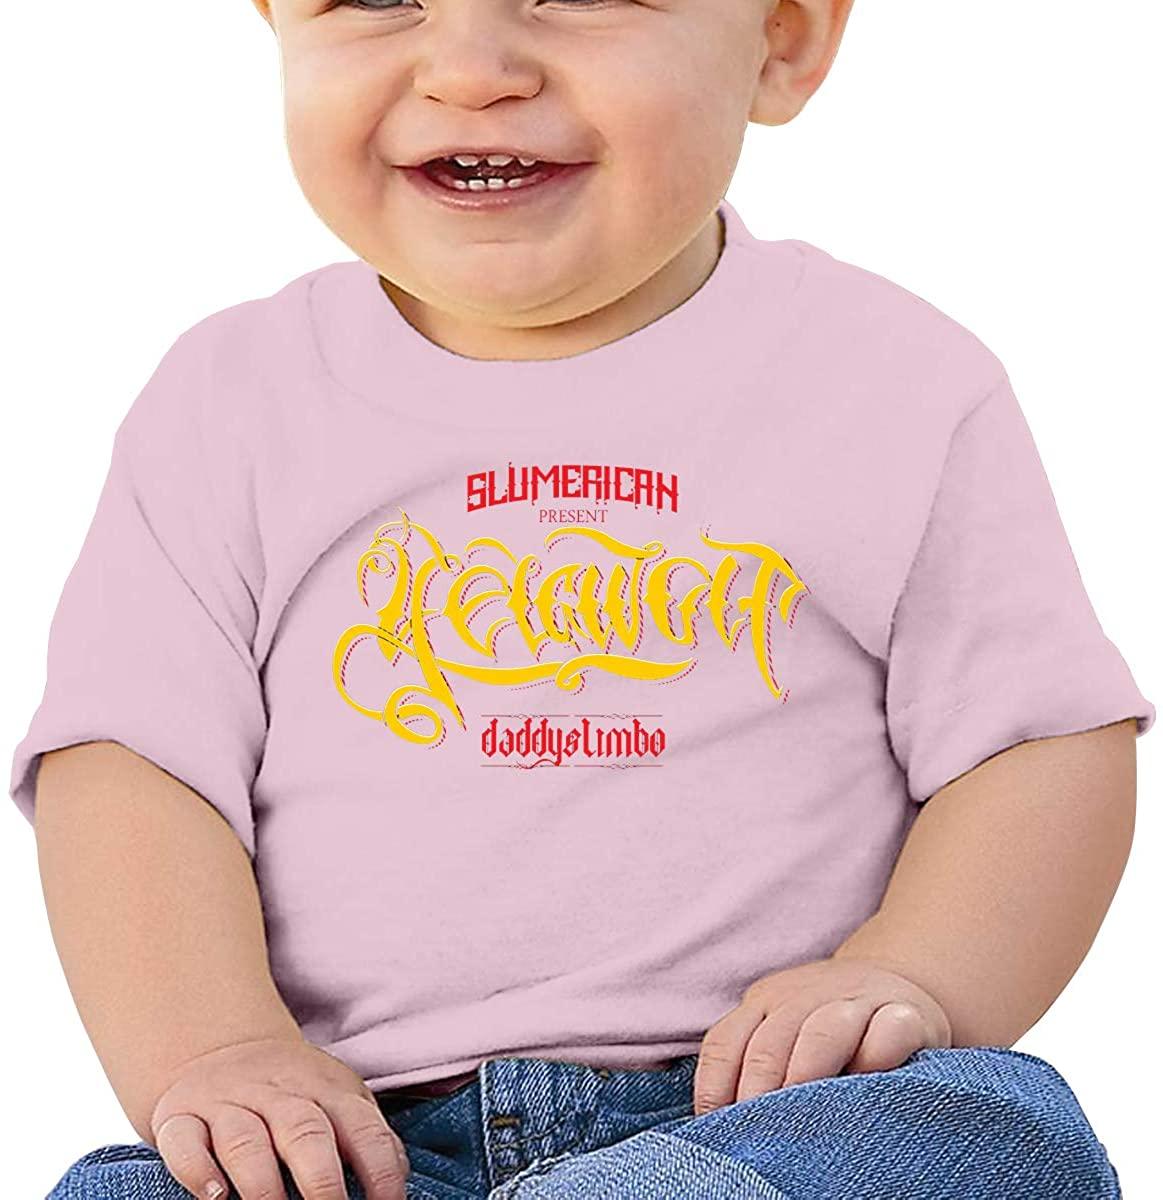 6-24 Months Boy and Girl Baby Short Sleeve T-Shirt Yelawolf Original Minimalist Style Pink